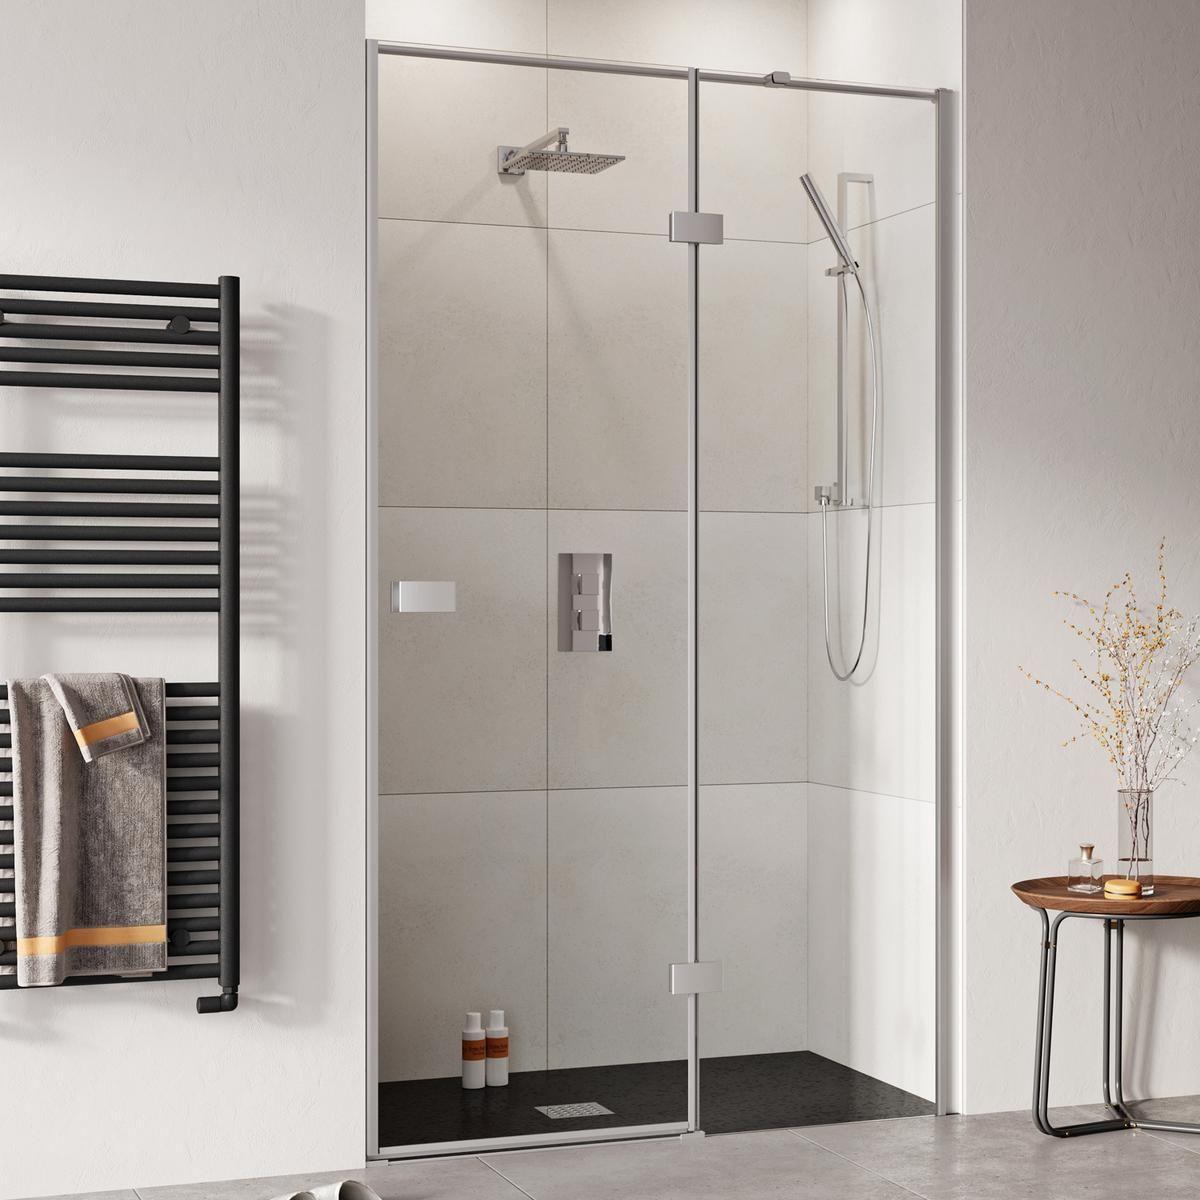 Tissino Lugano Frameless Hinged Shower Door With In Line Panel